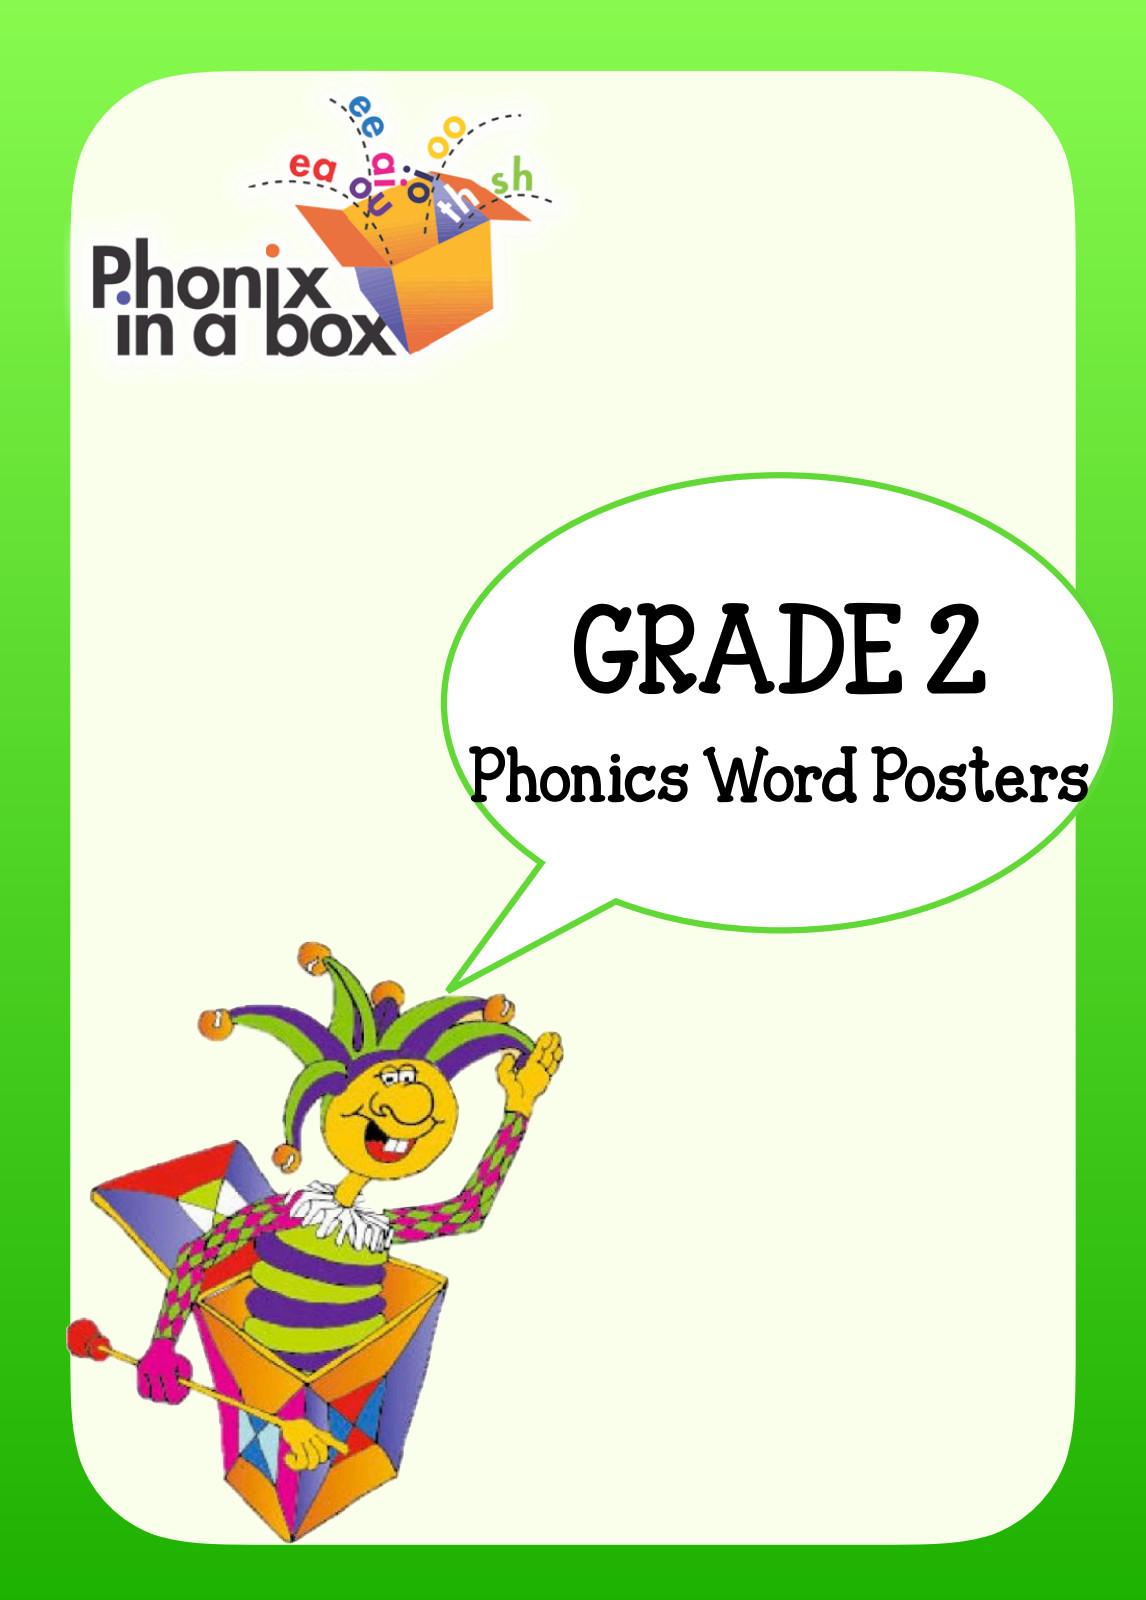 Grade 2 Phonics Word Posters